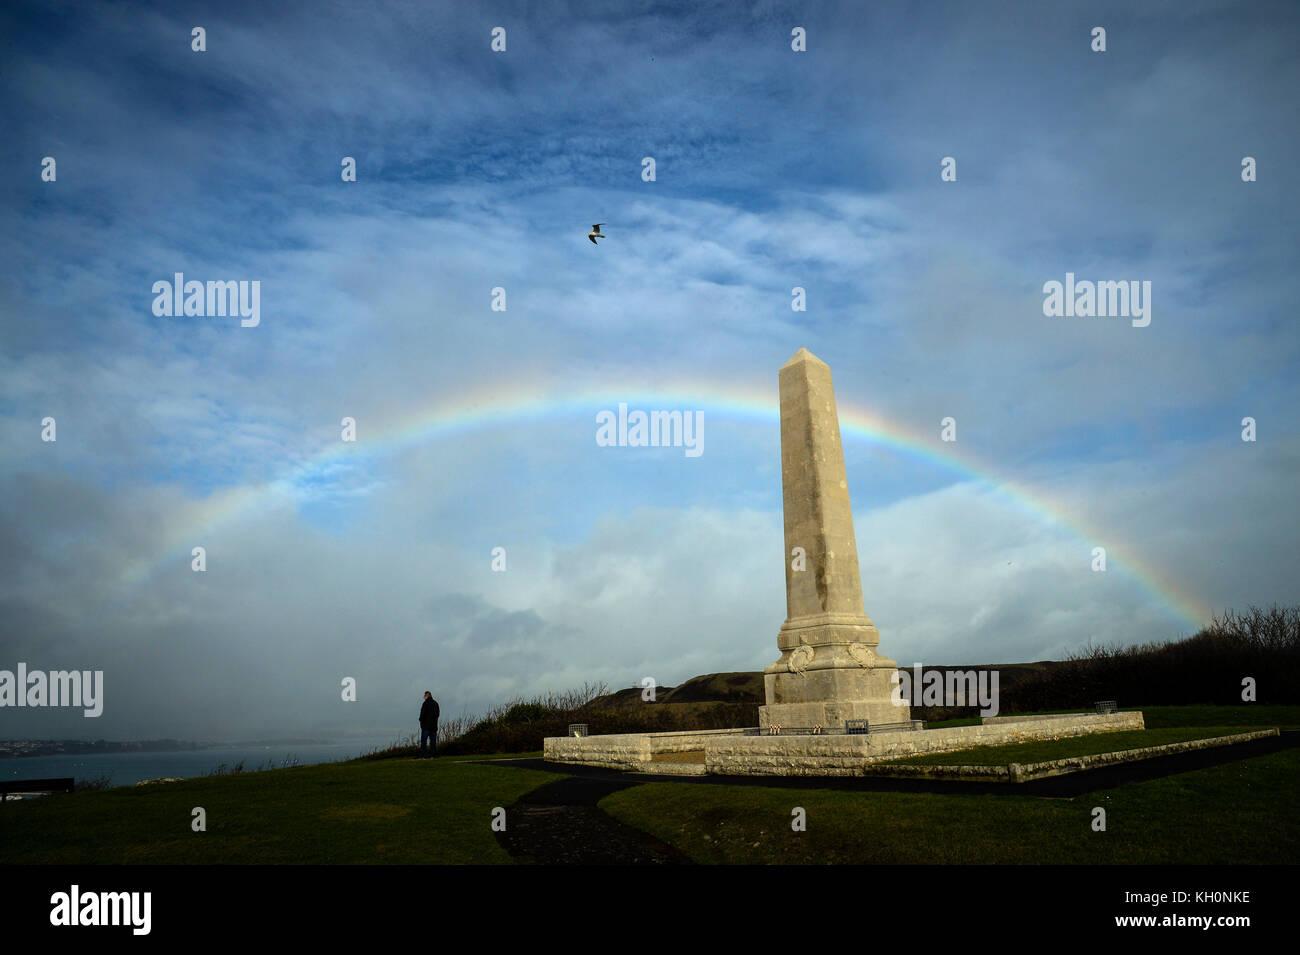 Rainbow over Portland Cenotaph War Memorial, Dorset, UK Credit: Finnbarr Webster/Alamy Live News - Stock Image